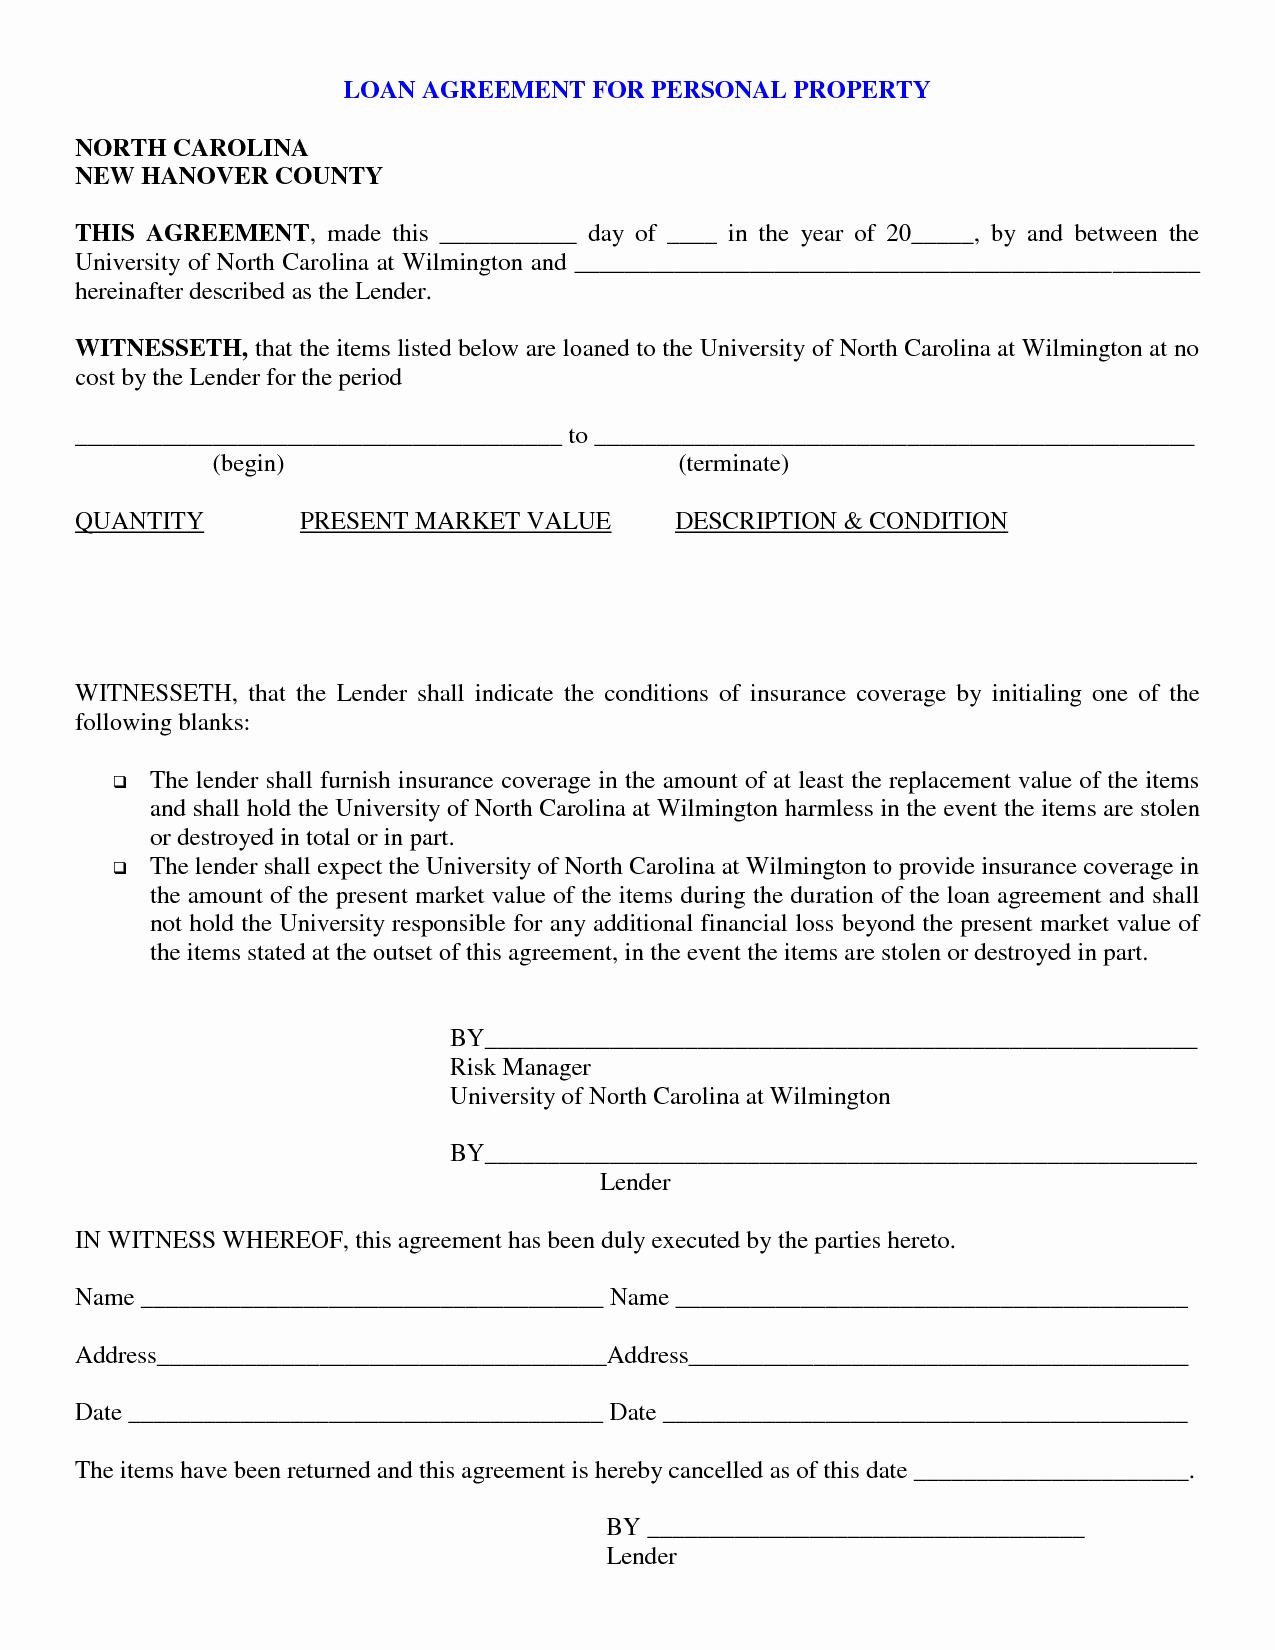 Loan form Template Unique Free Personal Loan Paperwork —bad Credit Car Loans